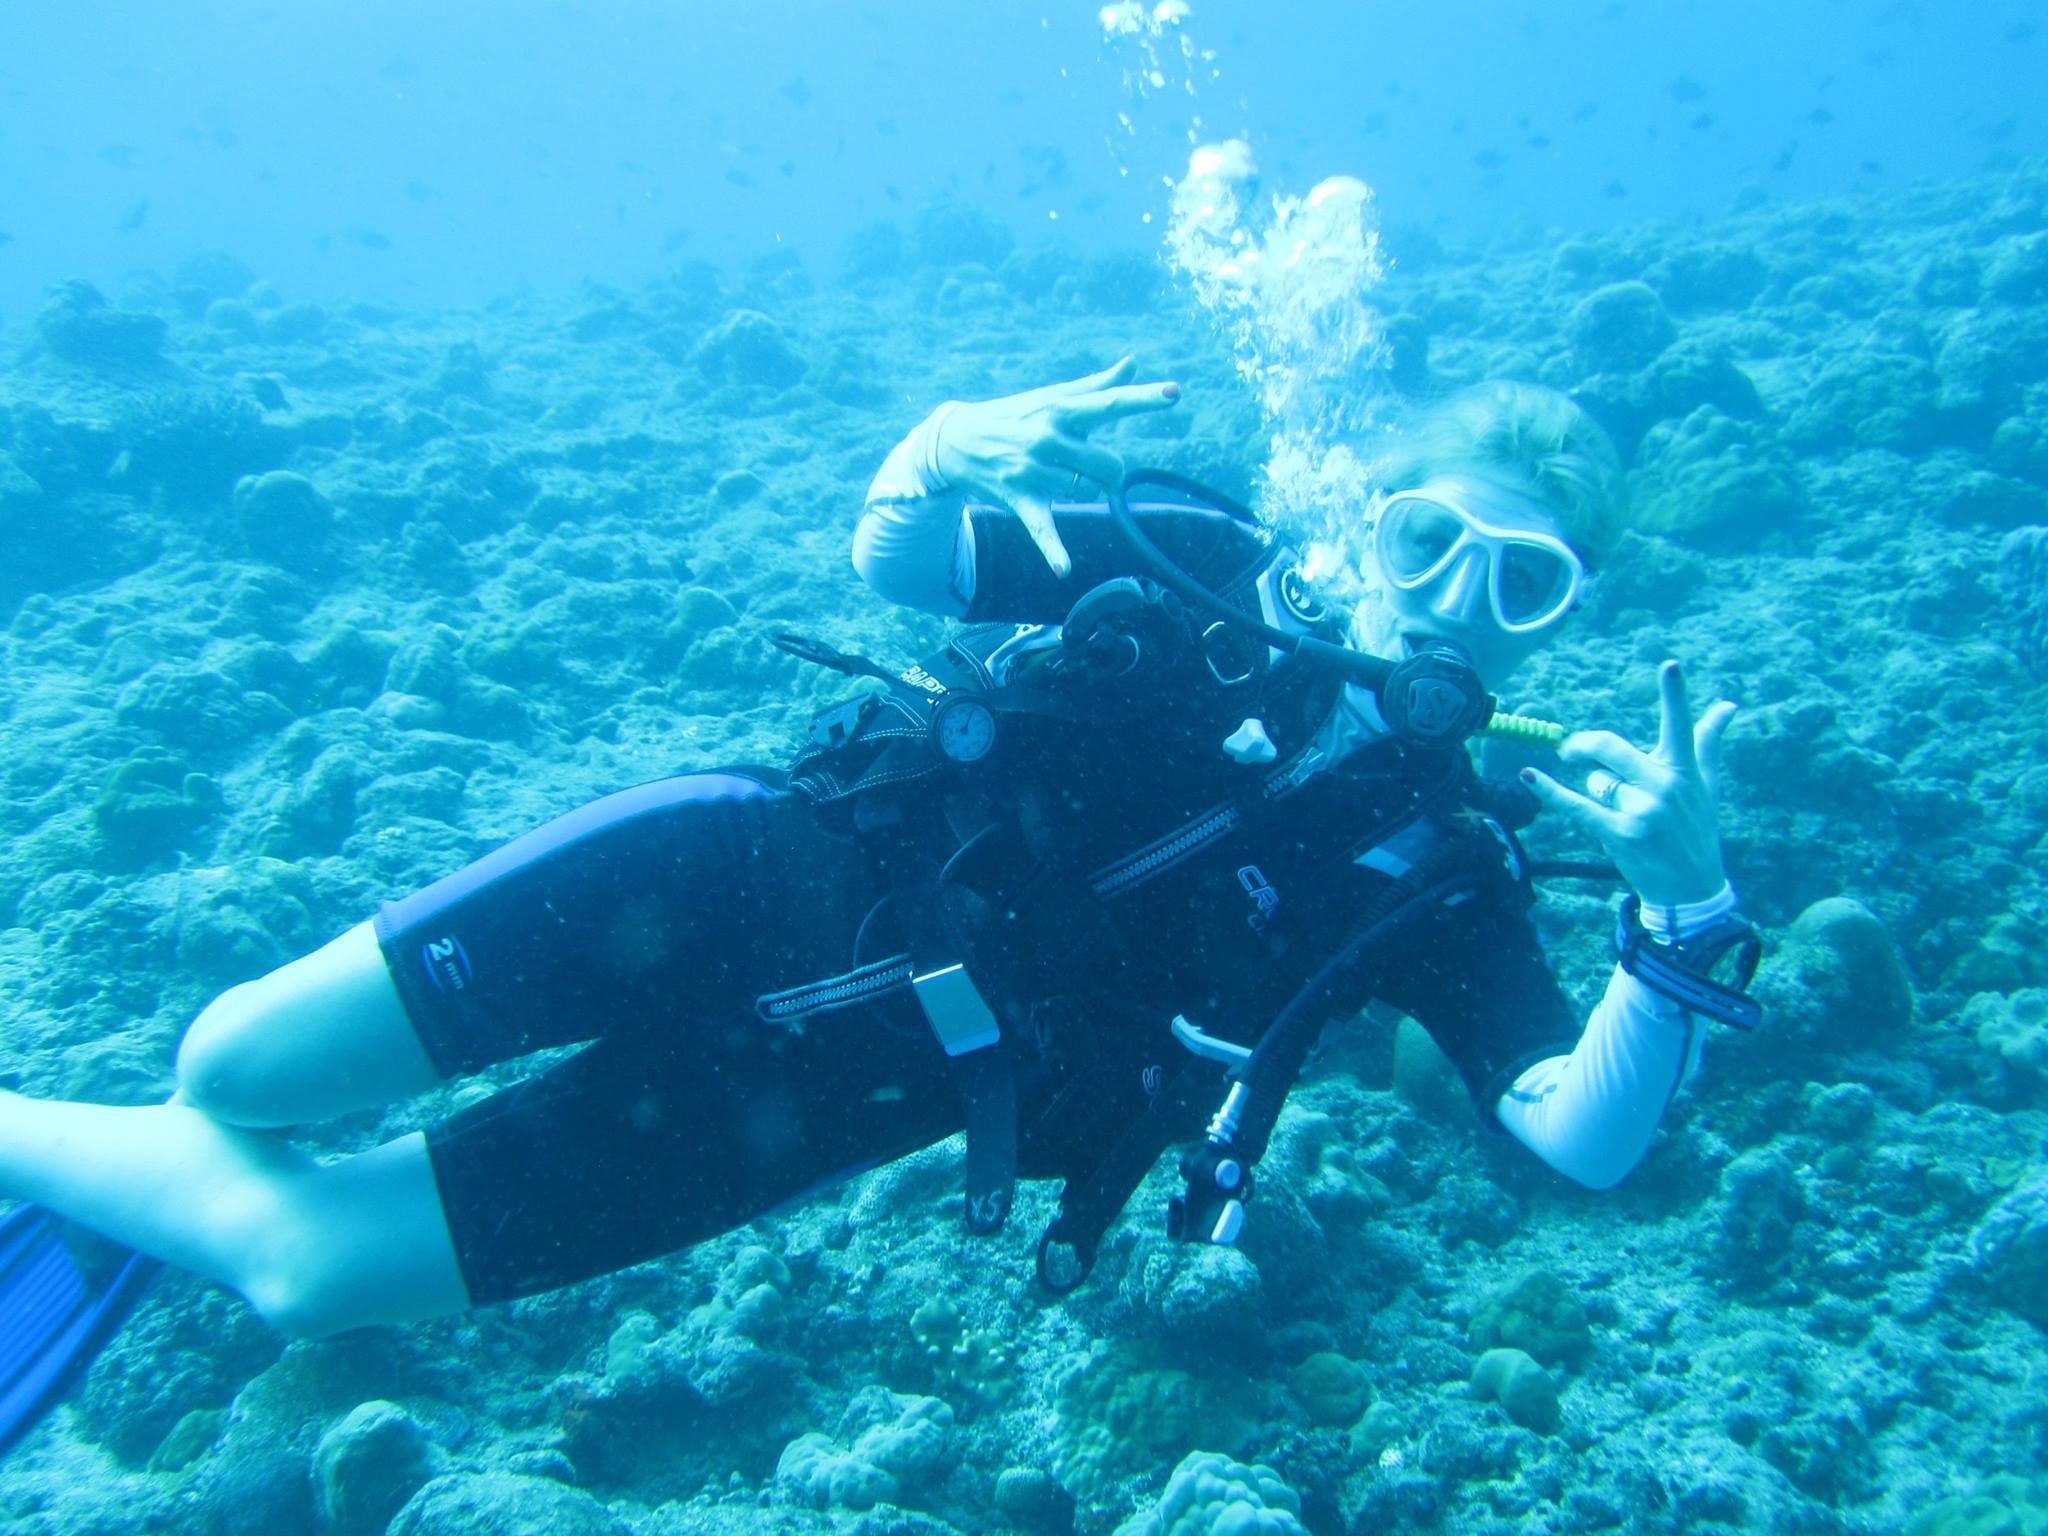 invite-to-paradise-sri-lanka-and-maldives-specialists-travel-agent-tour-operator-customer-review--feedback-joel-rhian-atmopshere-kanifushi-diving-3.jpg